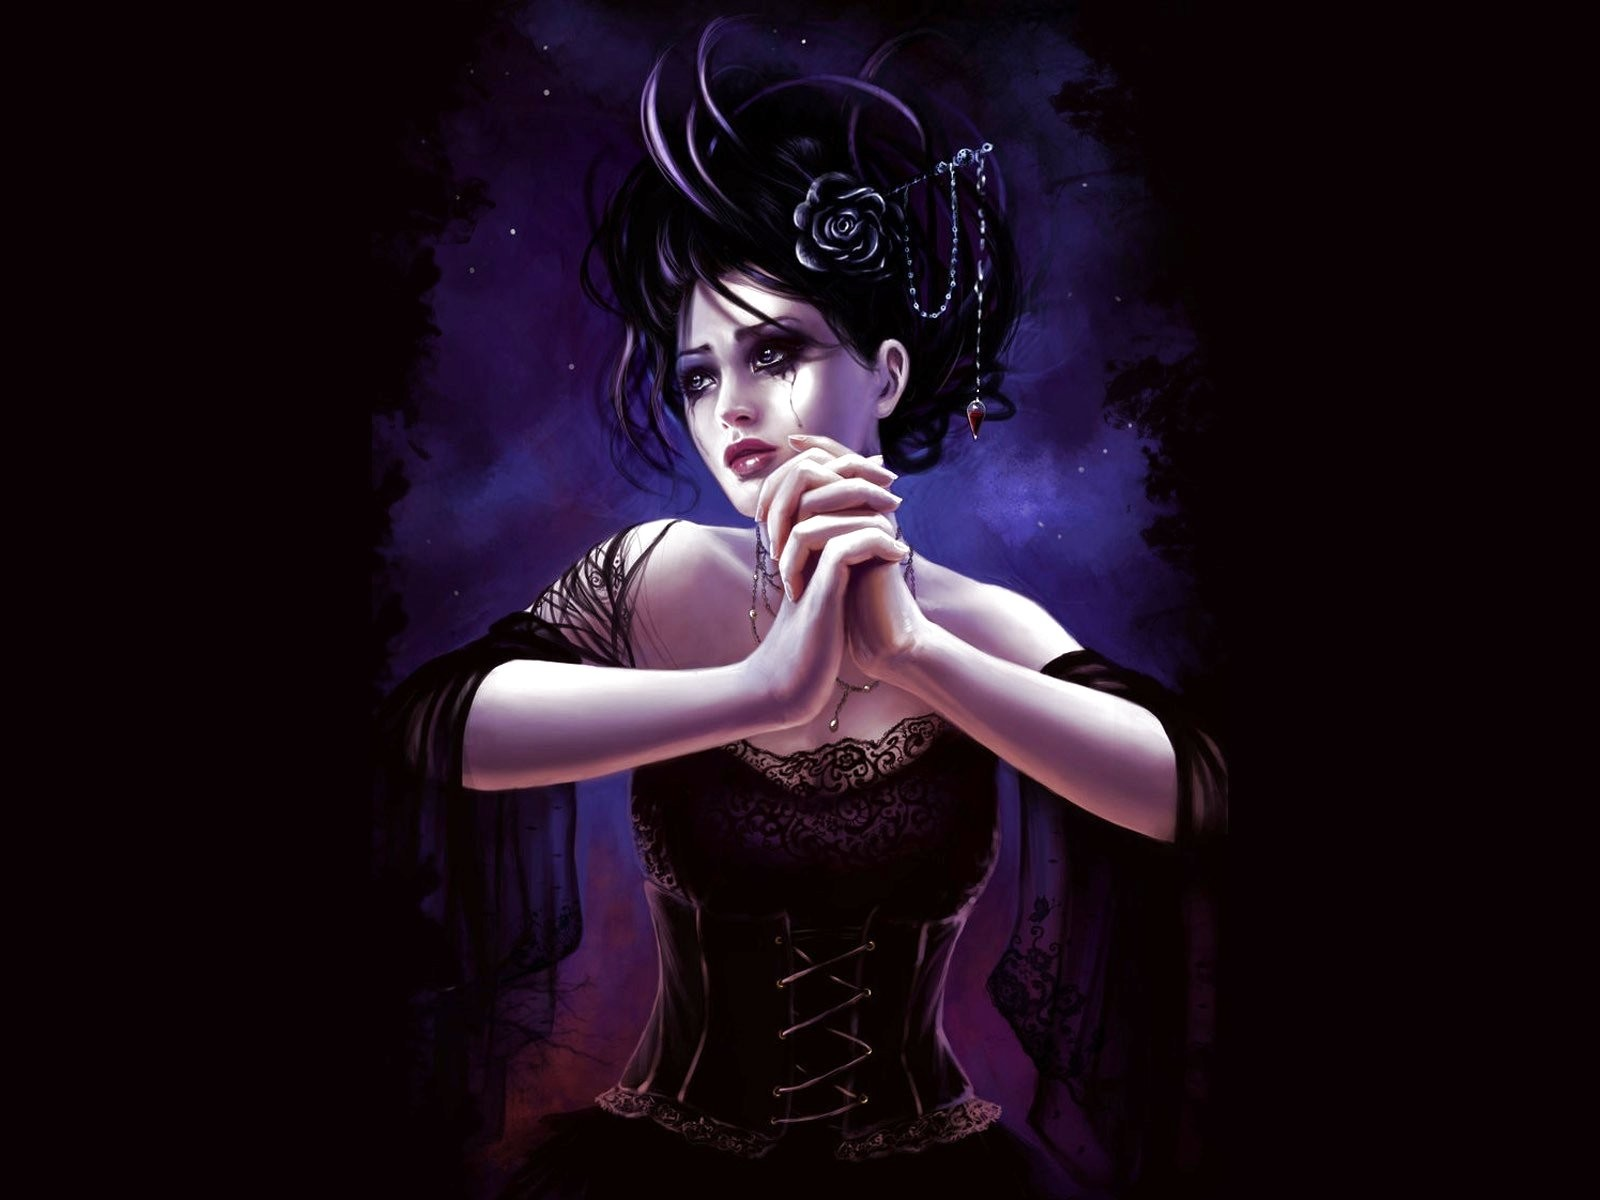 Artwork,960755 Dark, Wallpapers, Original, Cute, Art, - Illustration - HD Wallpaper